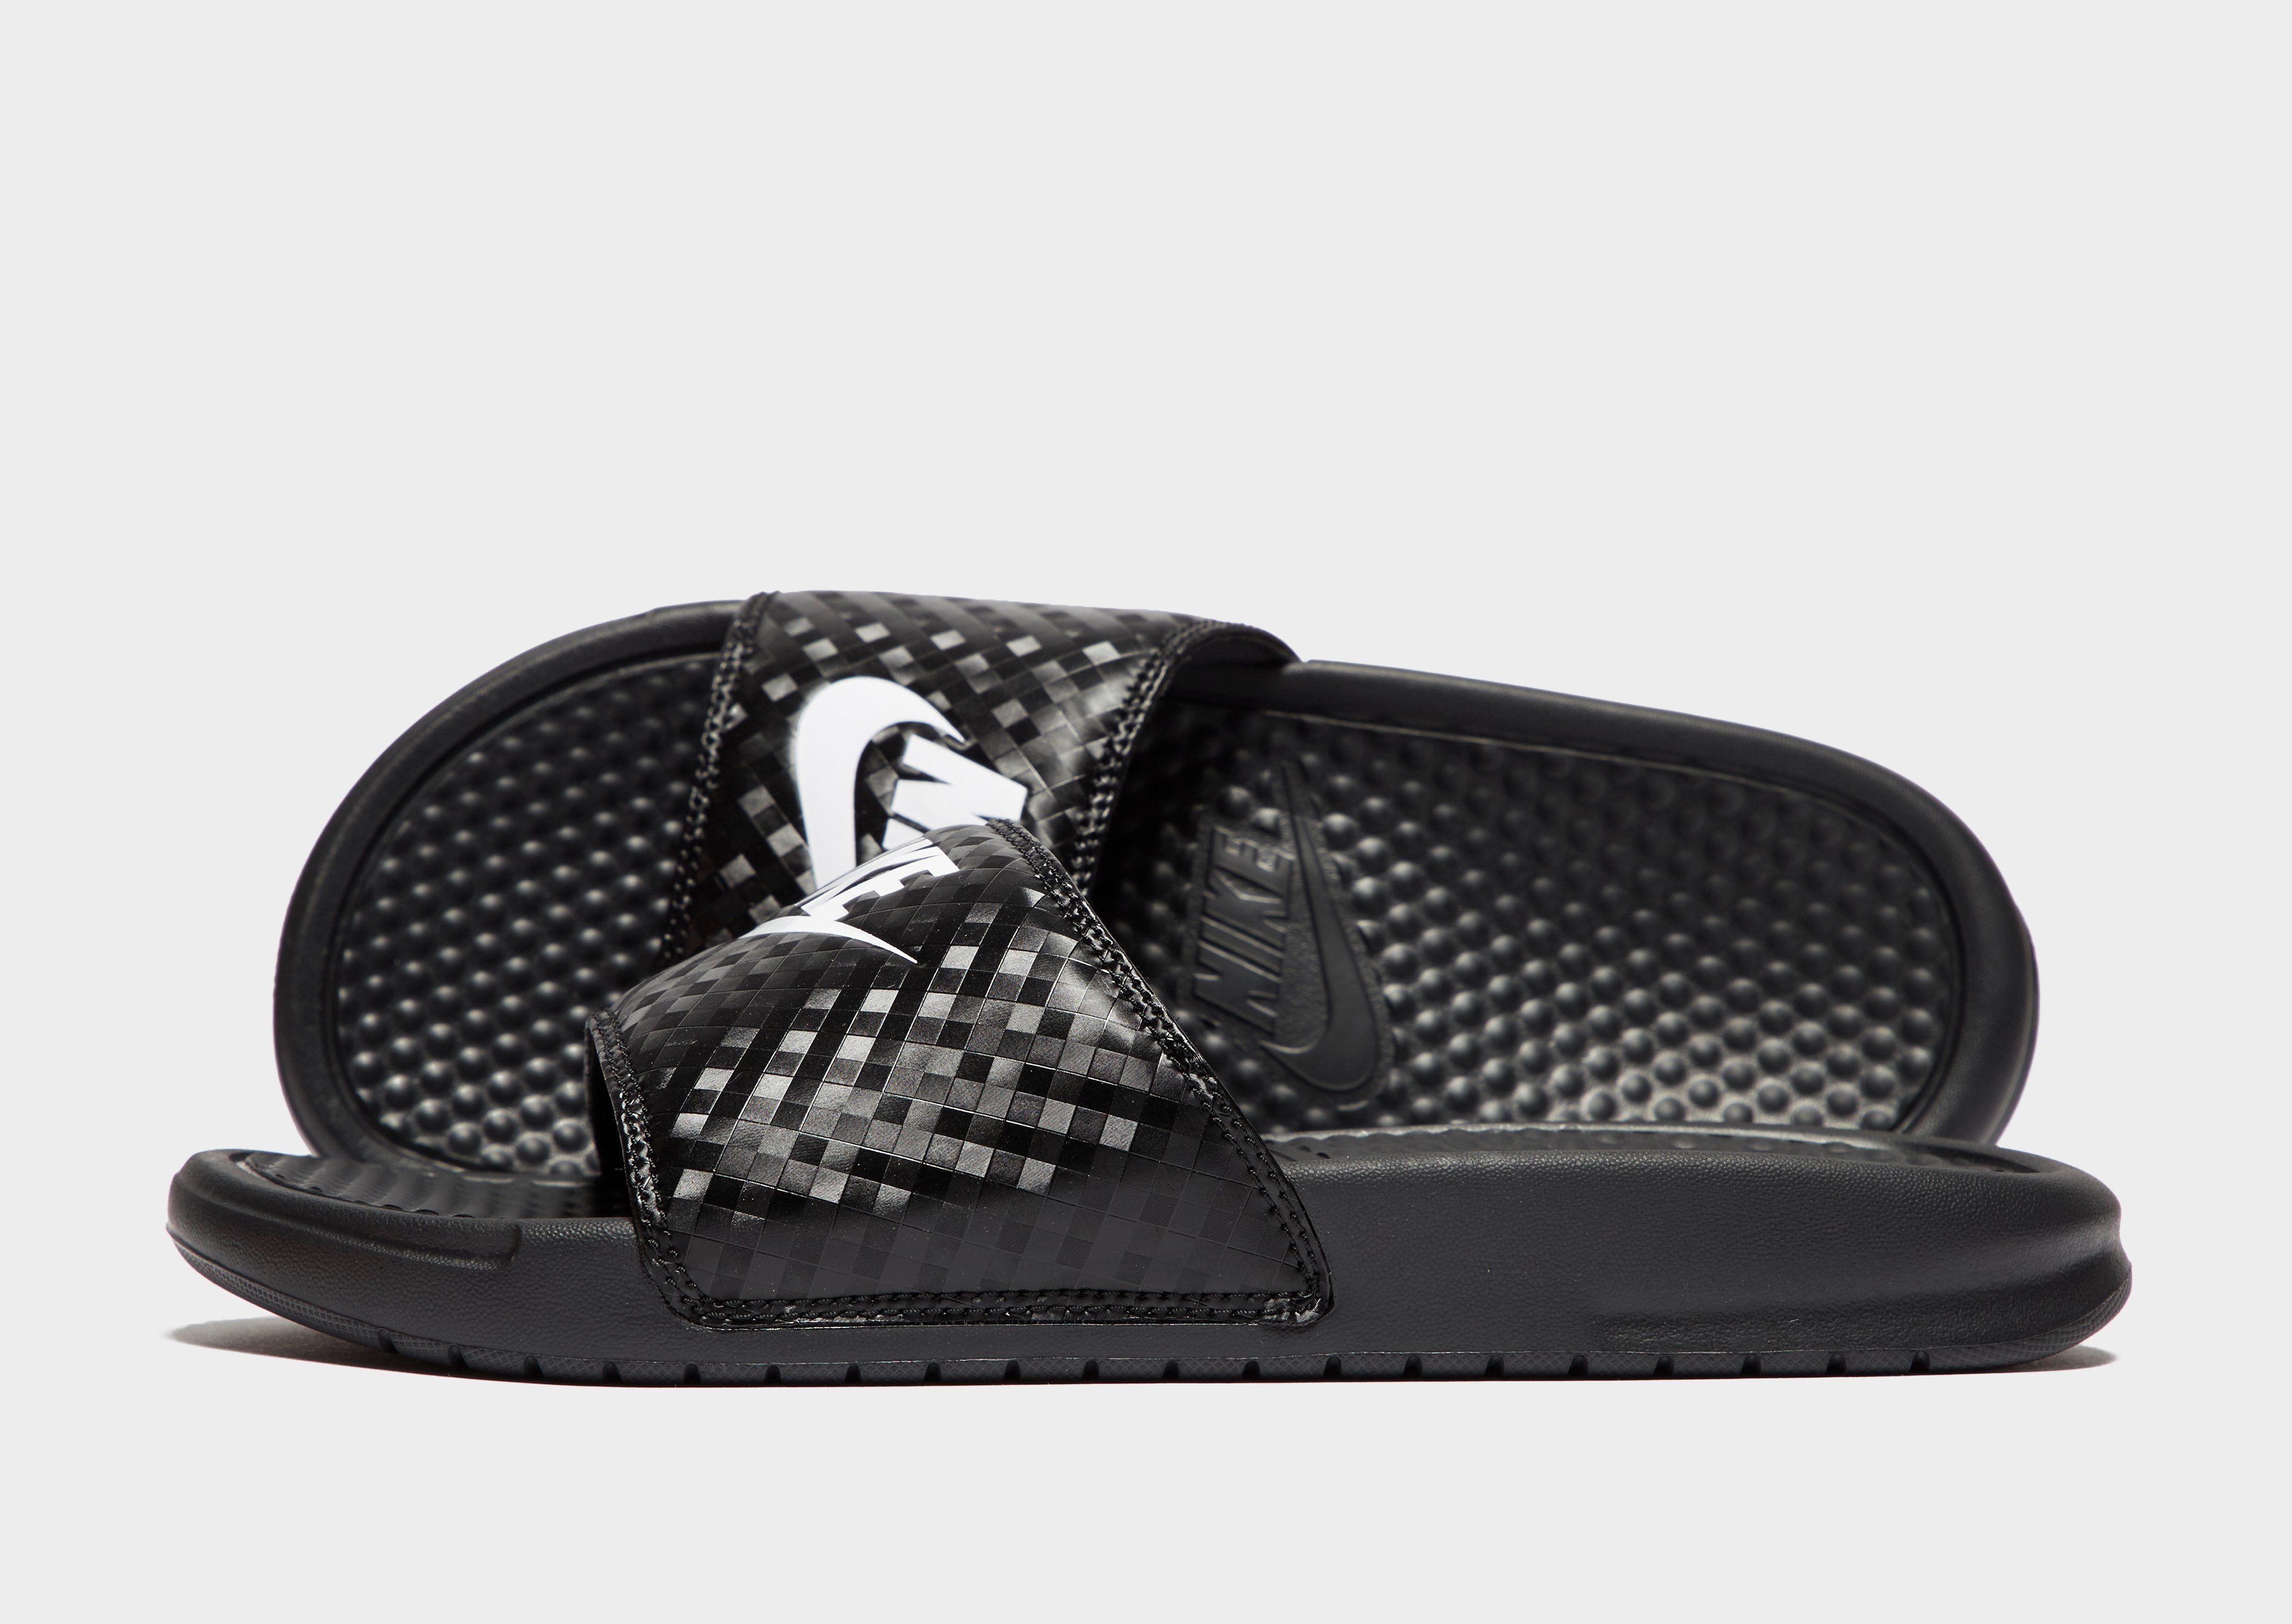 Nike Chanclas BENASSI JUST DO IT para hombre pXiLMUvDQ